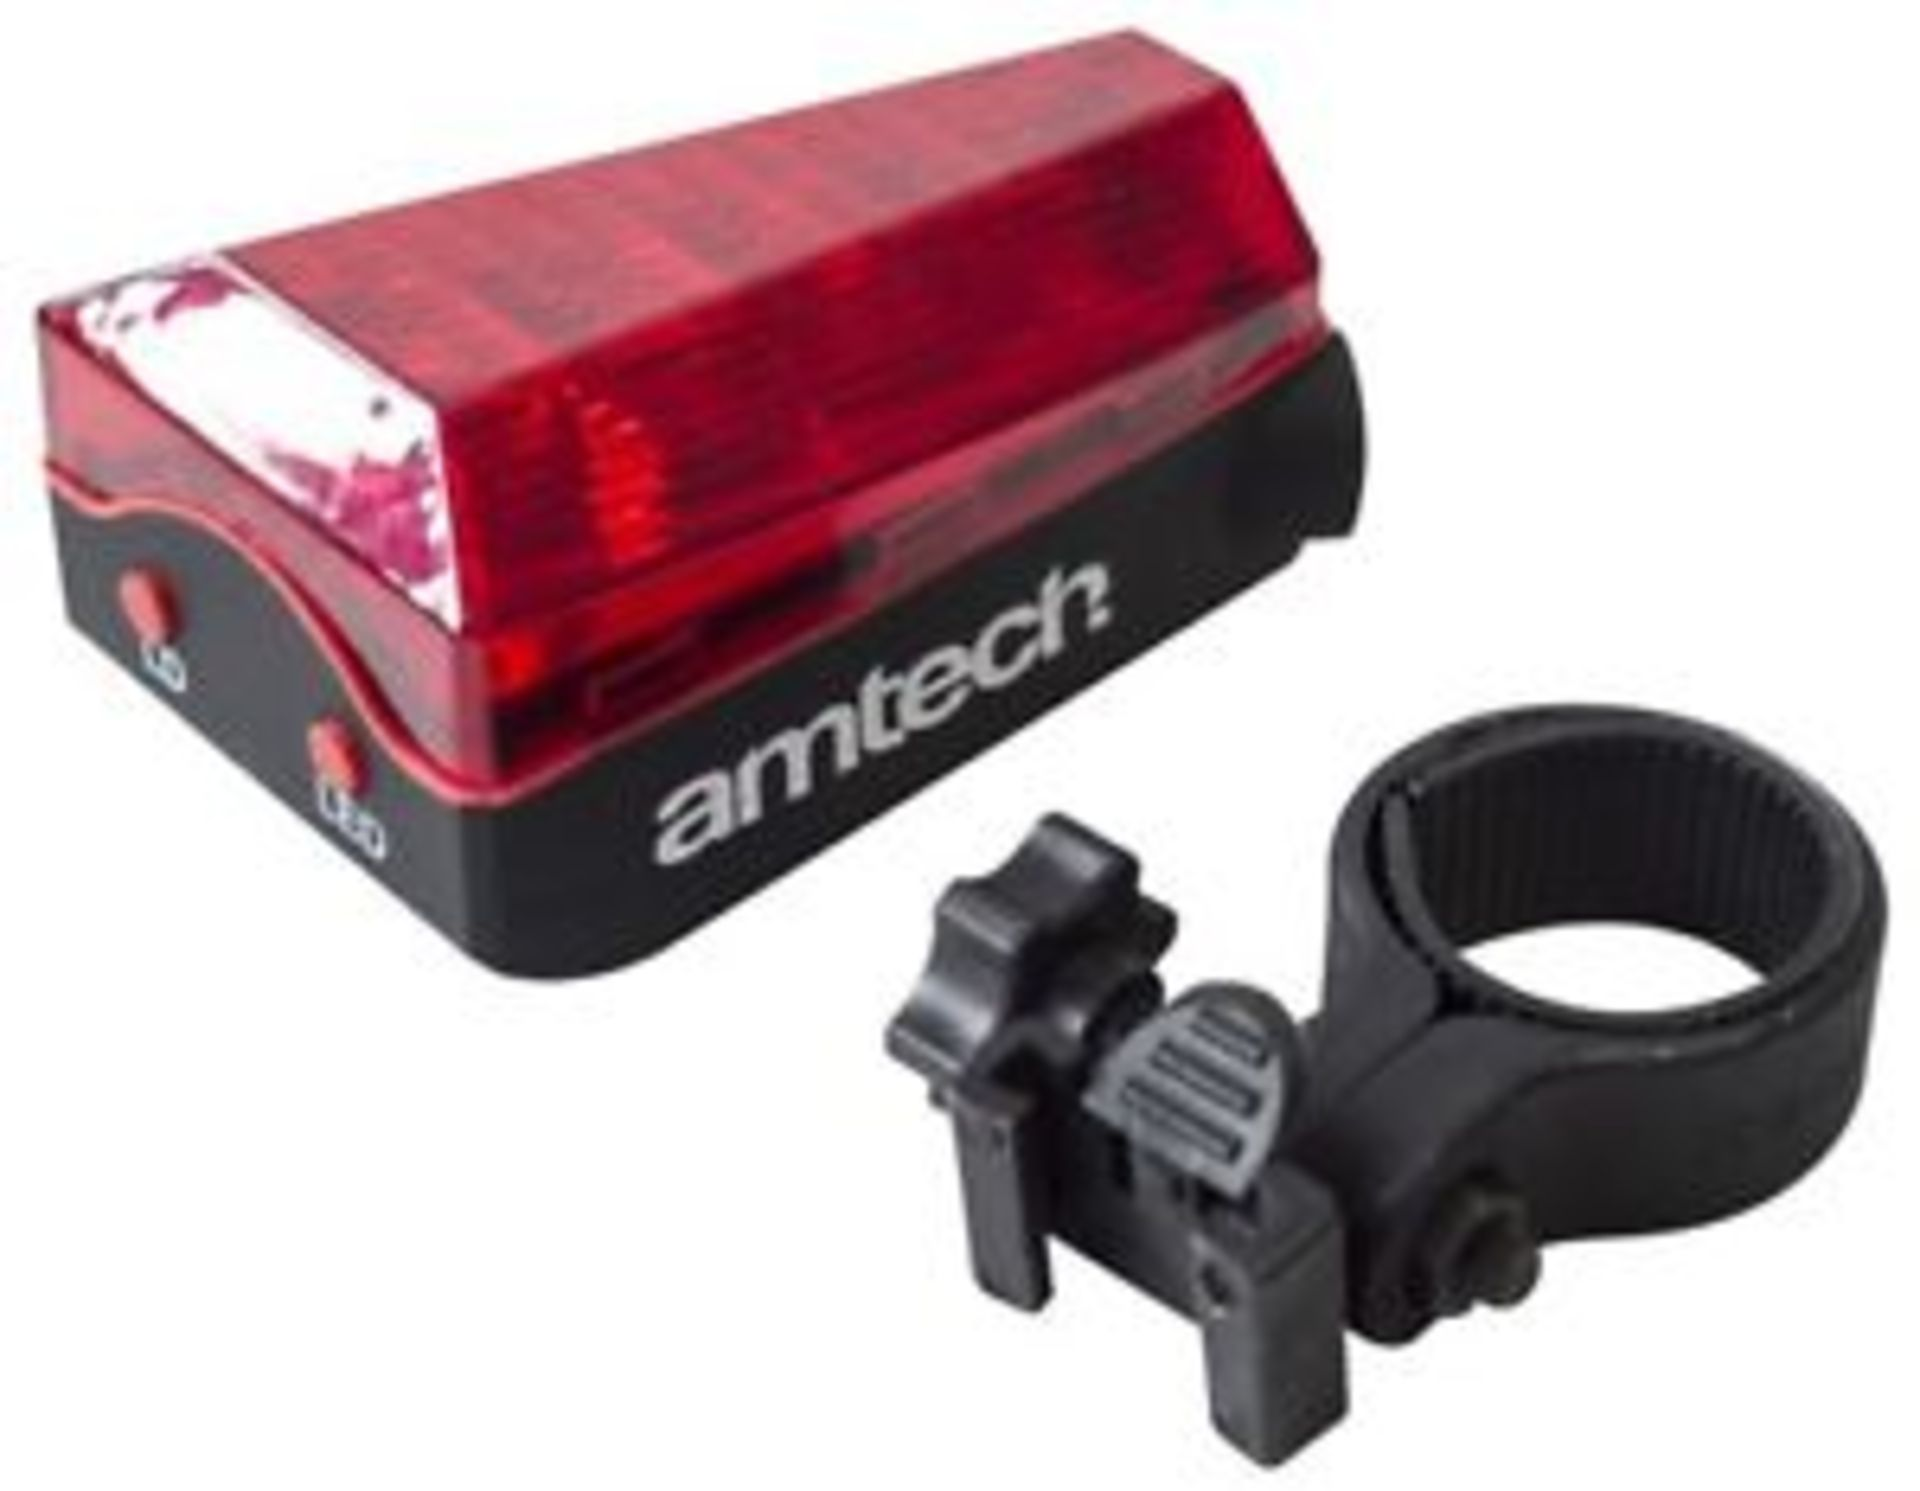 Lot 12450 - V Brand New Laser Tail LED Bike Light Includes 2xAA Batteries